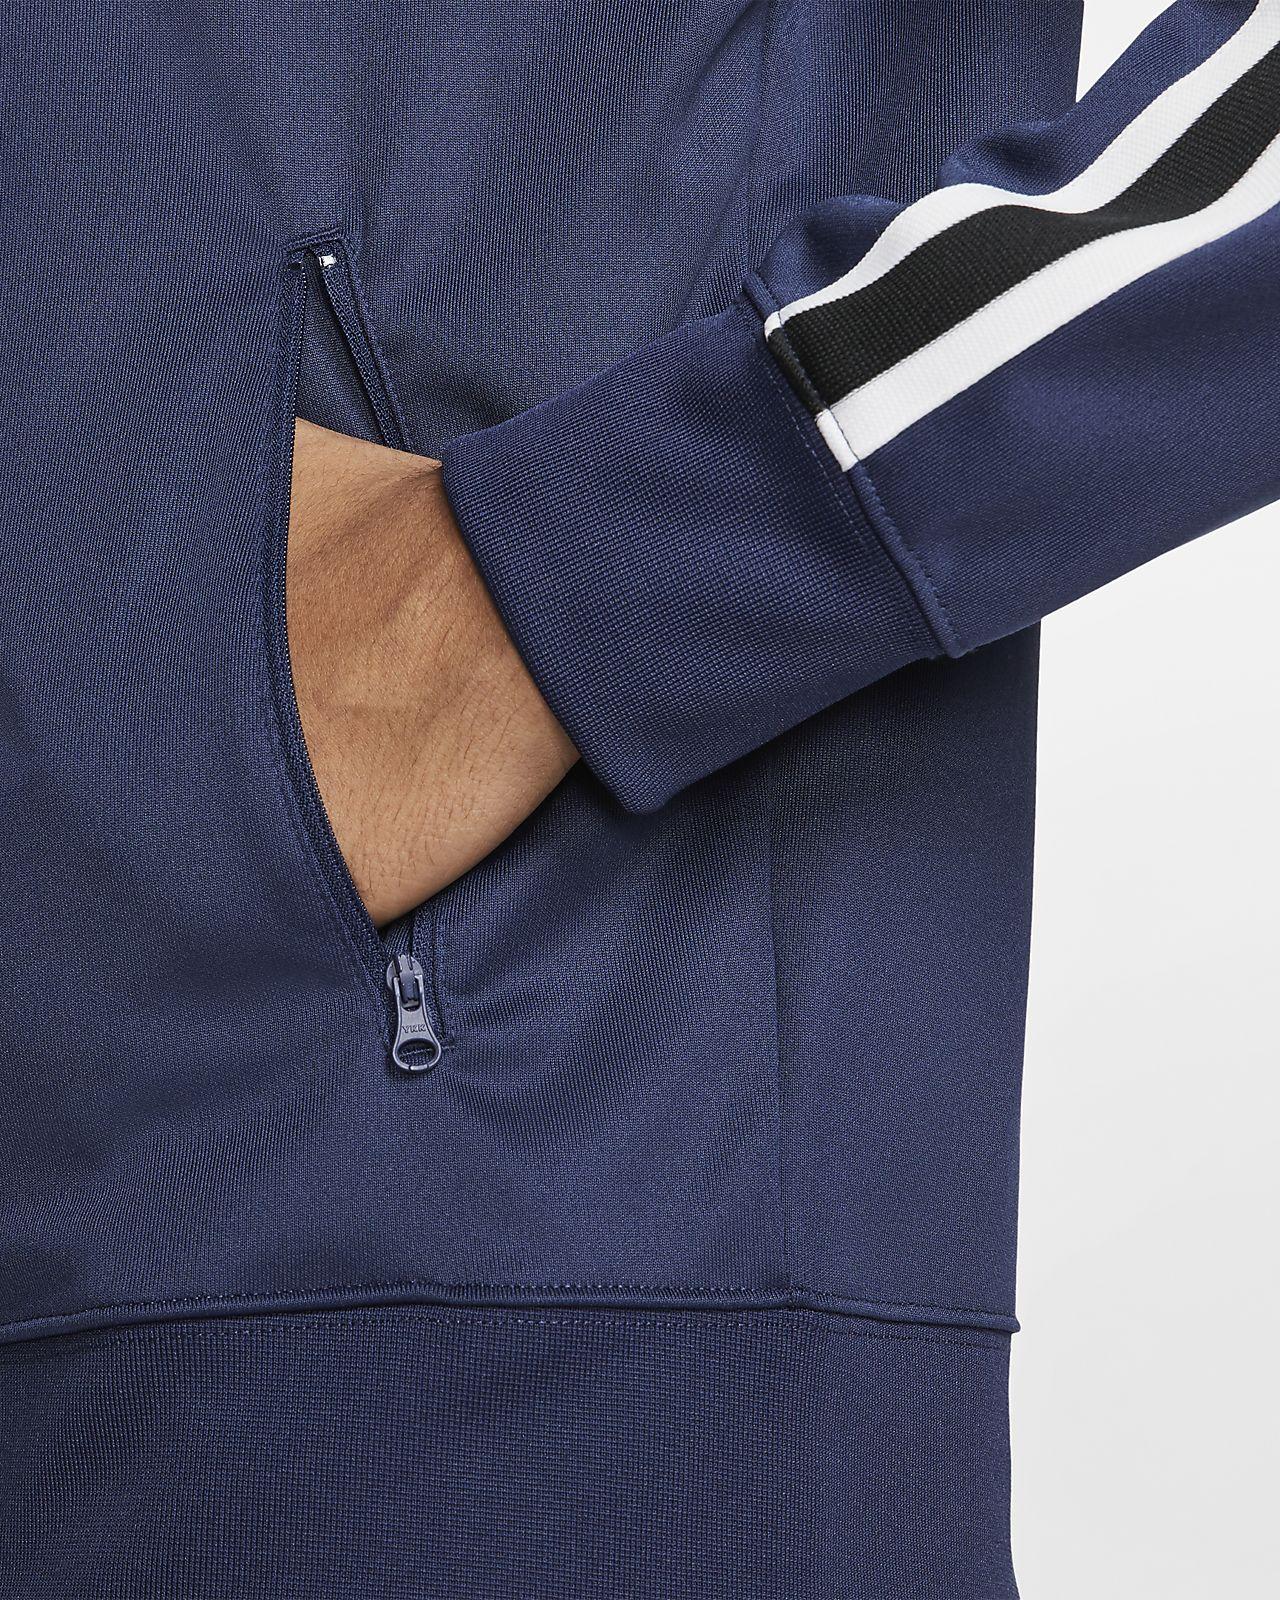 Trainingsjacke Für Sportswear N98 Nike Strick Herren VqULzMpSG